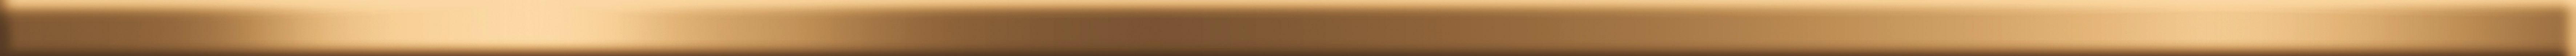 Tenor Gold BW0TNR09 Бордюр 600*13